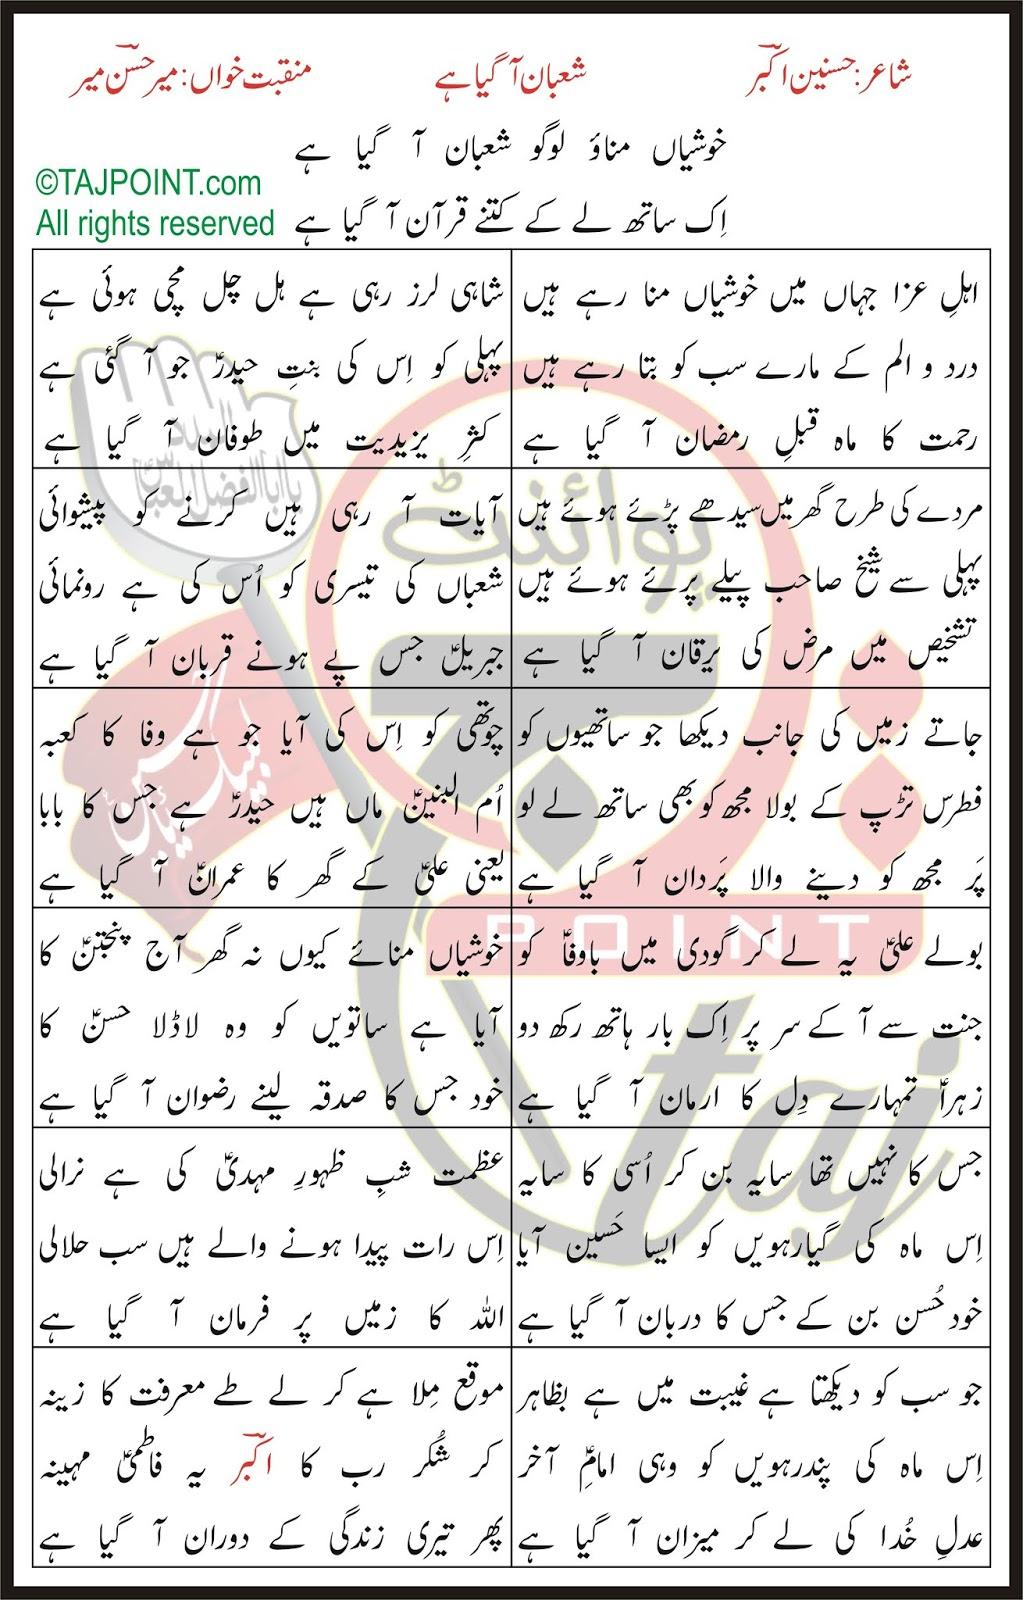 Imam mehdi manqabat lyrics